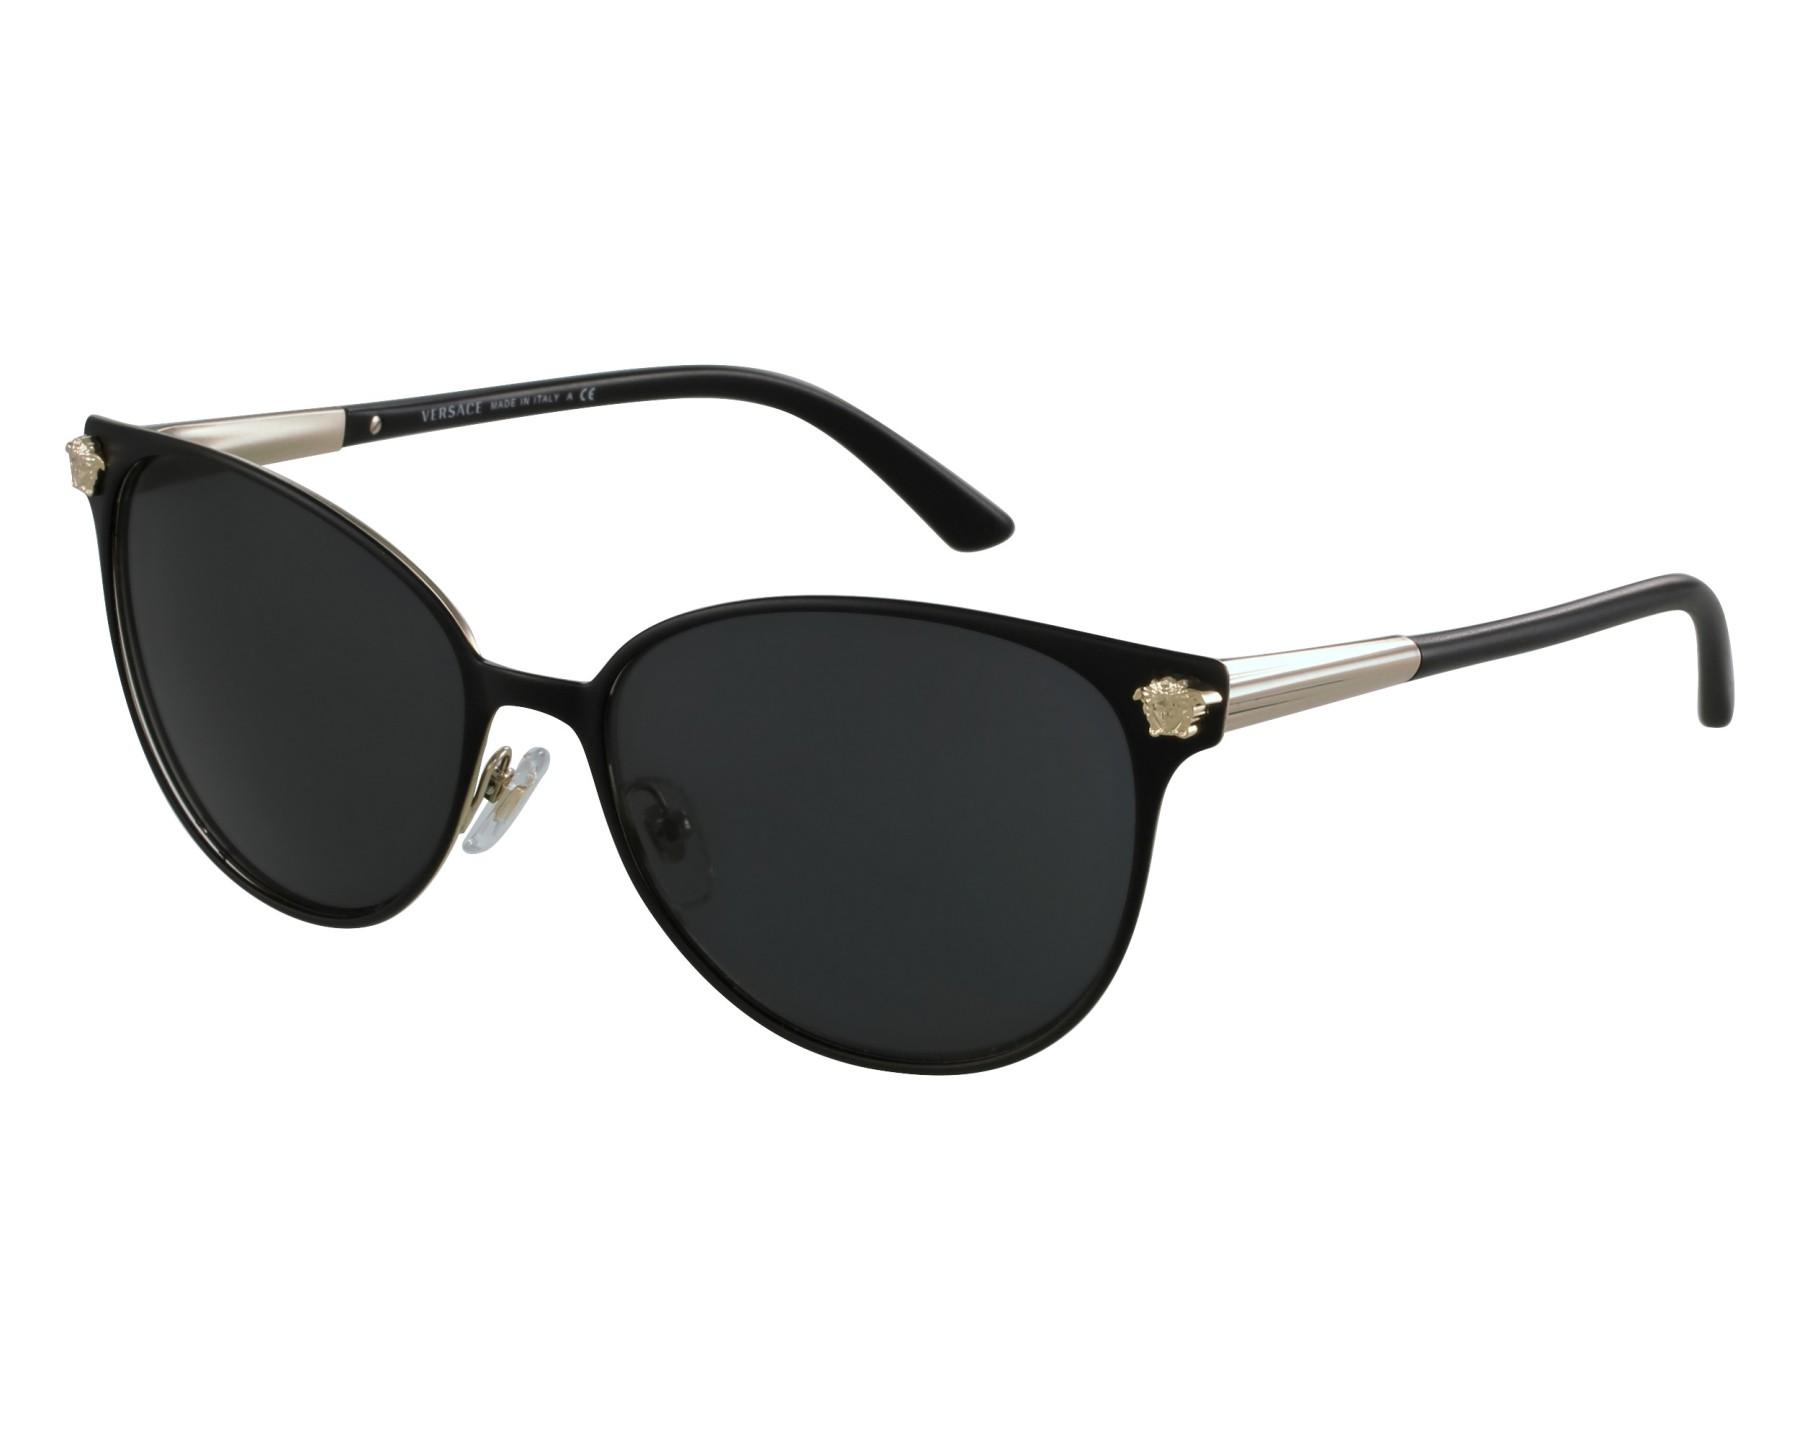 ea01eb43b54 Sunglasses Versace VE-2168 1377 87 57-16 Black Gold front view